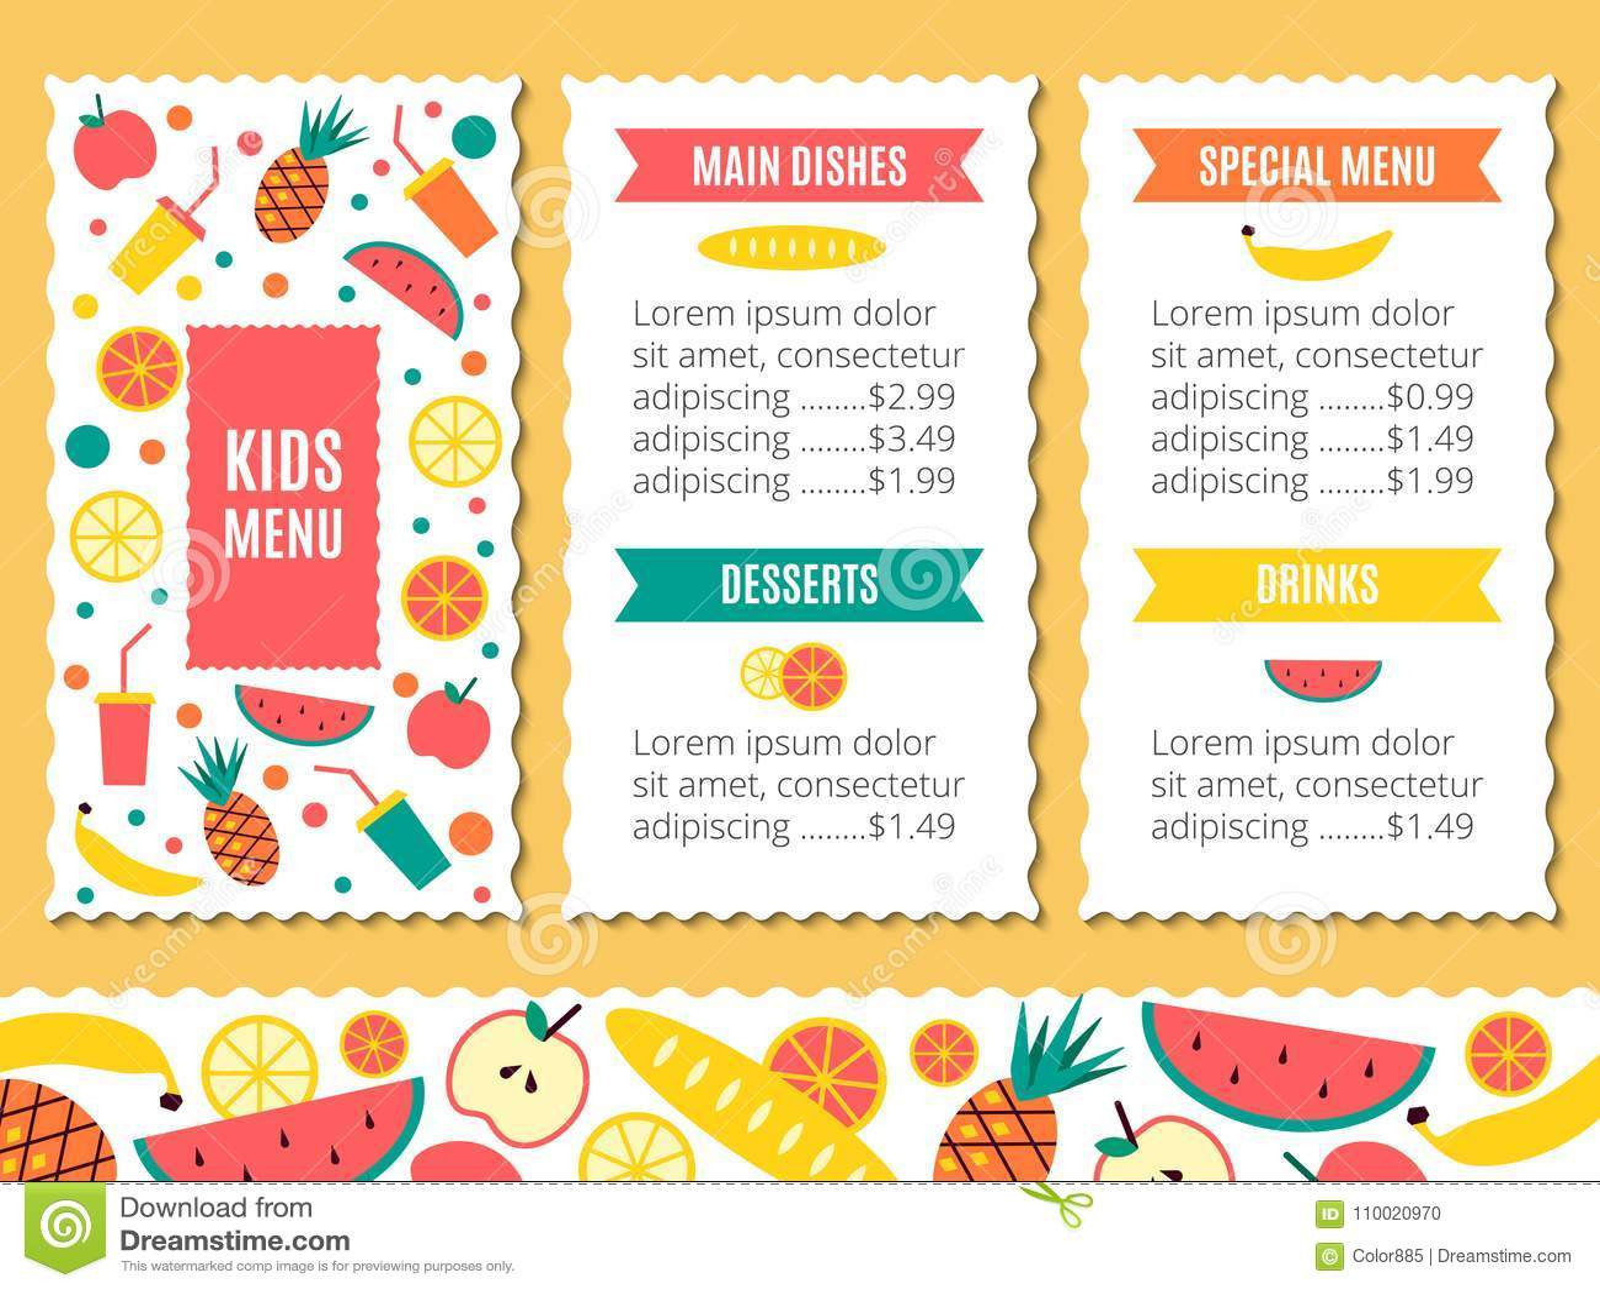 Cute Colorful Kids Meal Menu Template Illustration